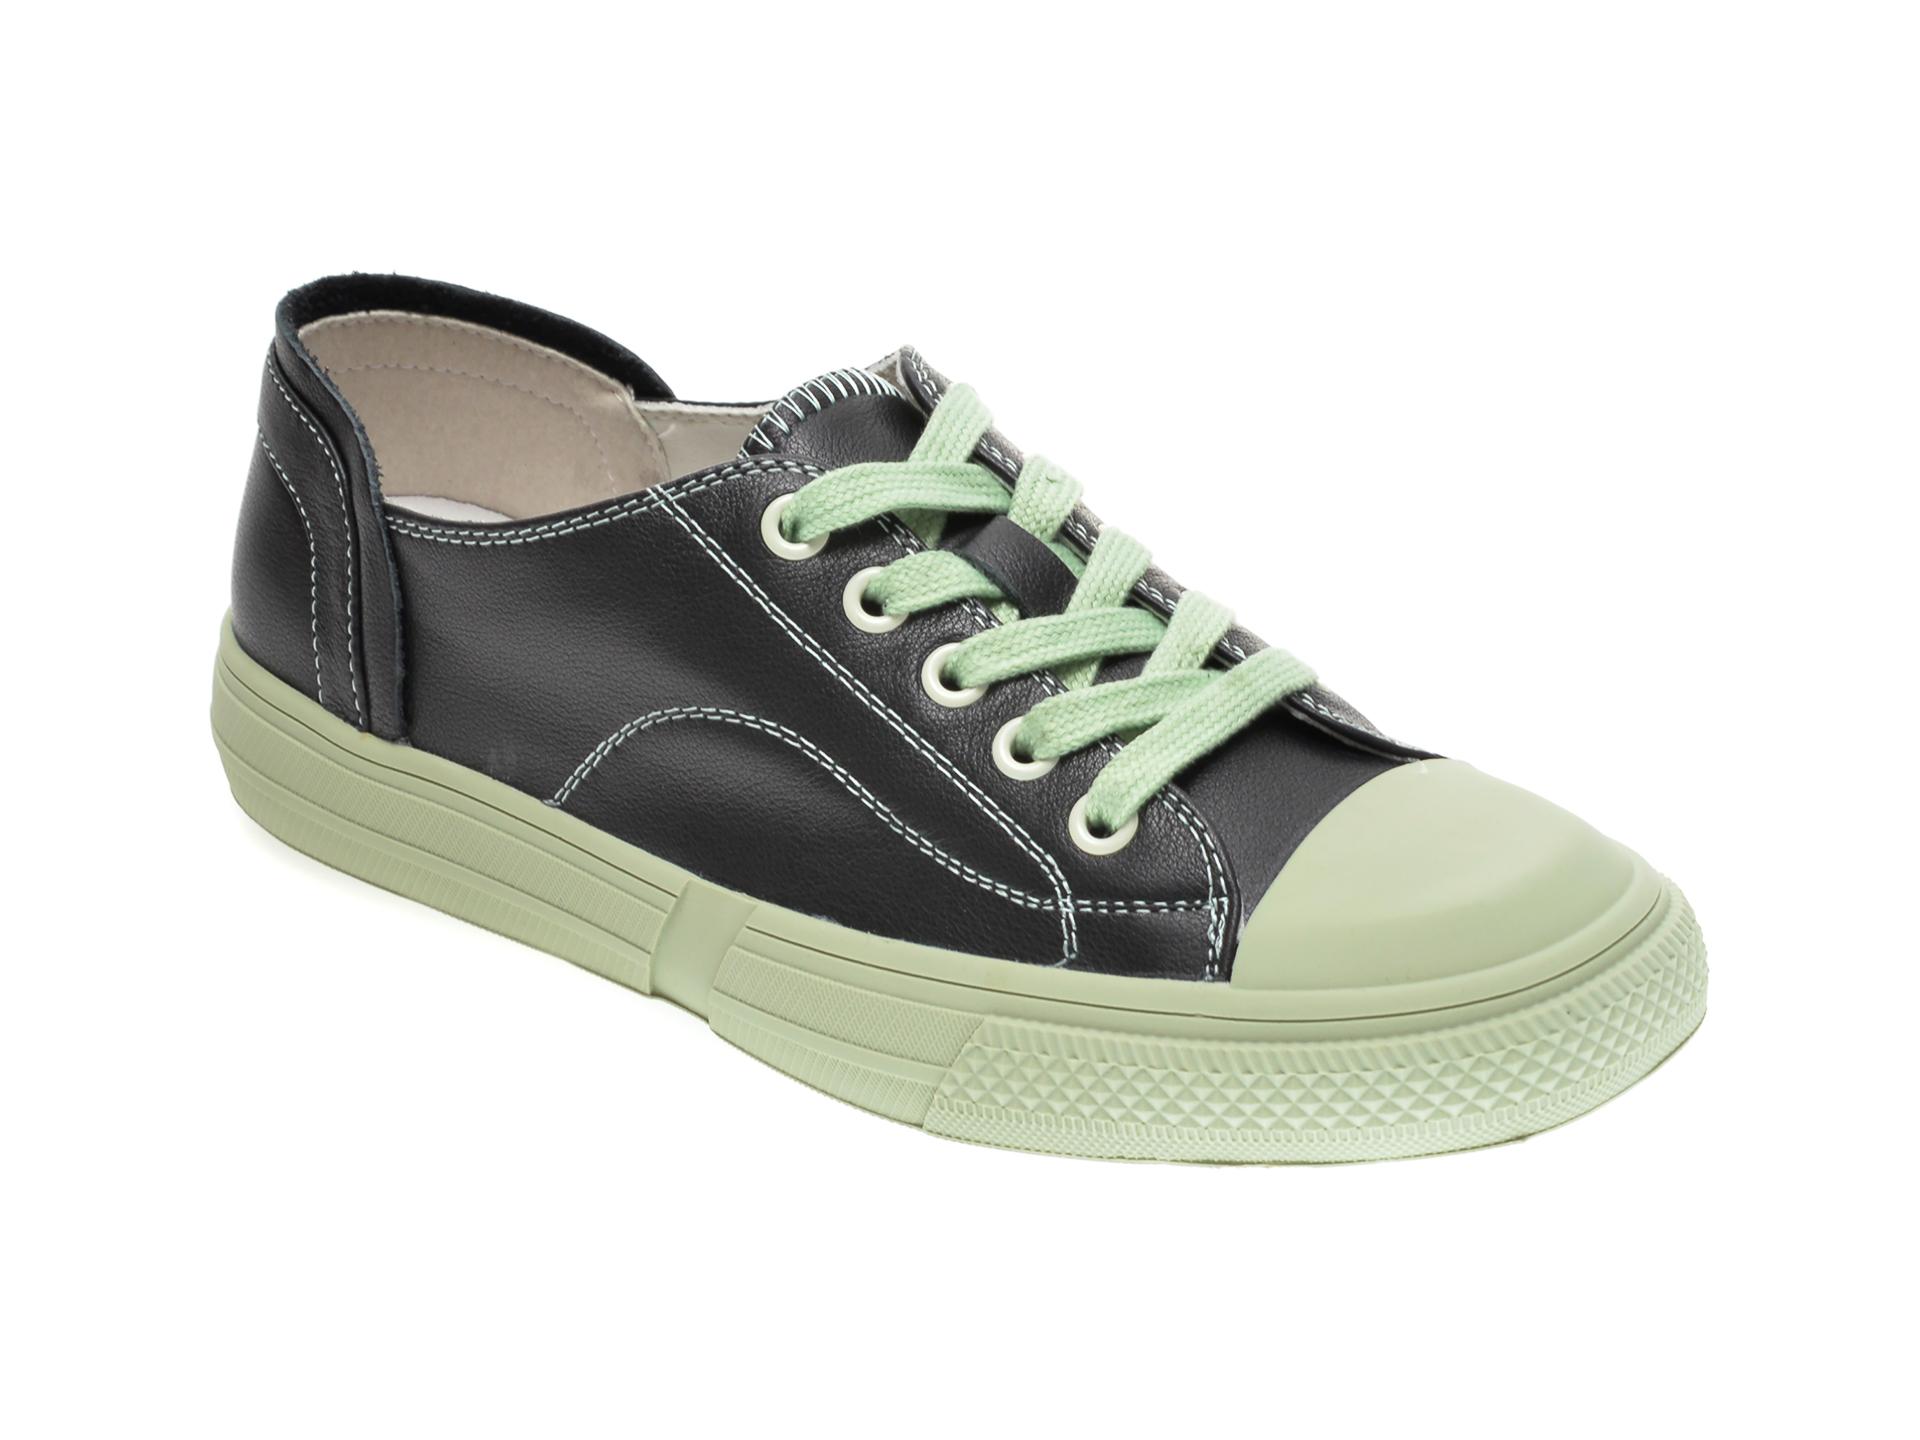 Pantofi sport GRYXX verzi, 6611, din piele naturala